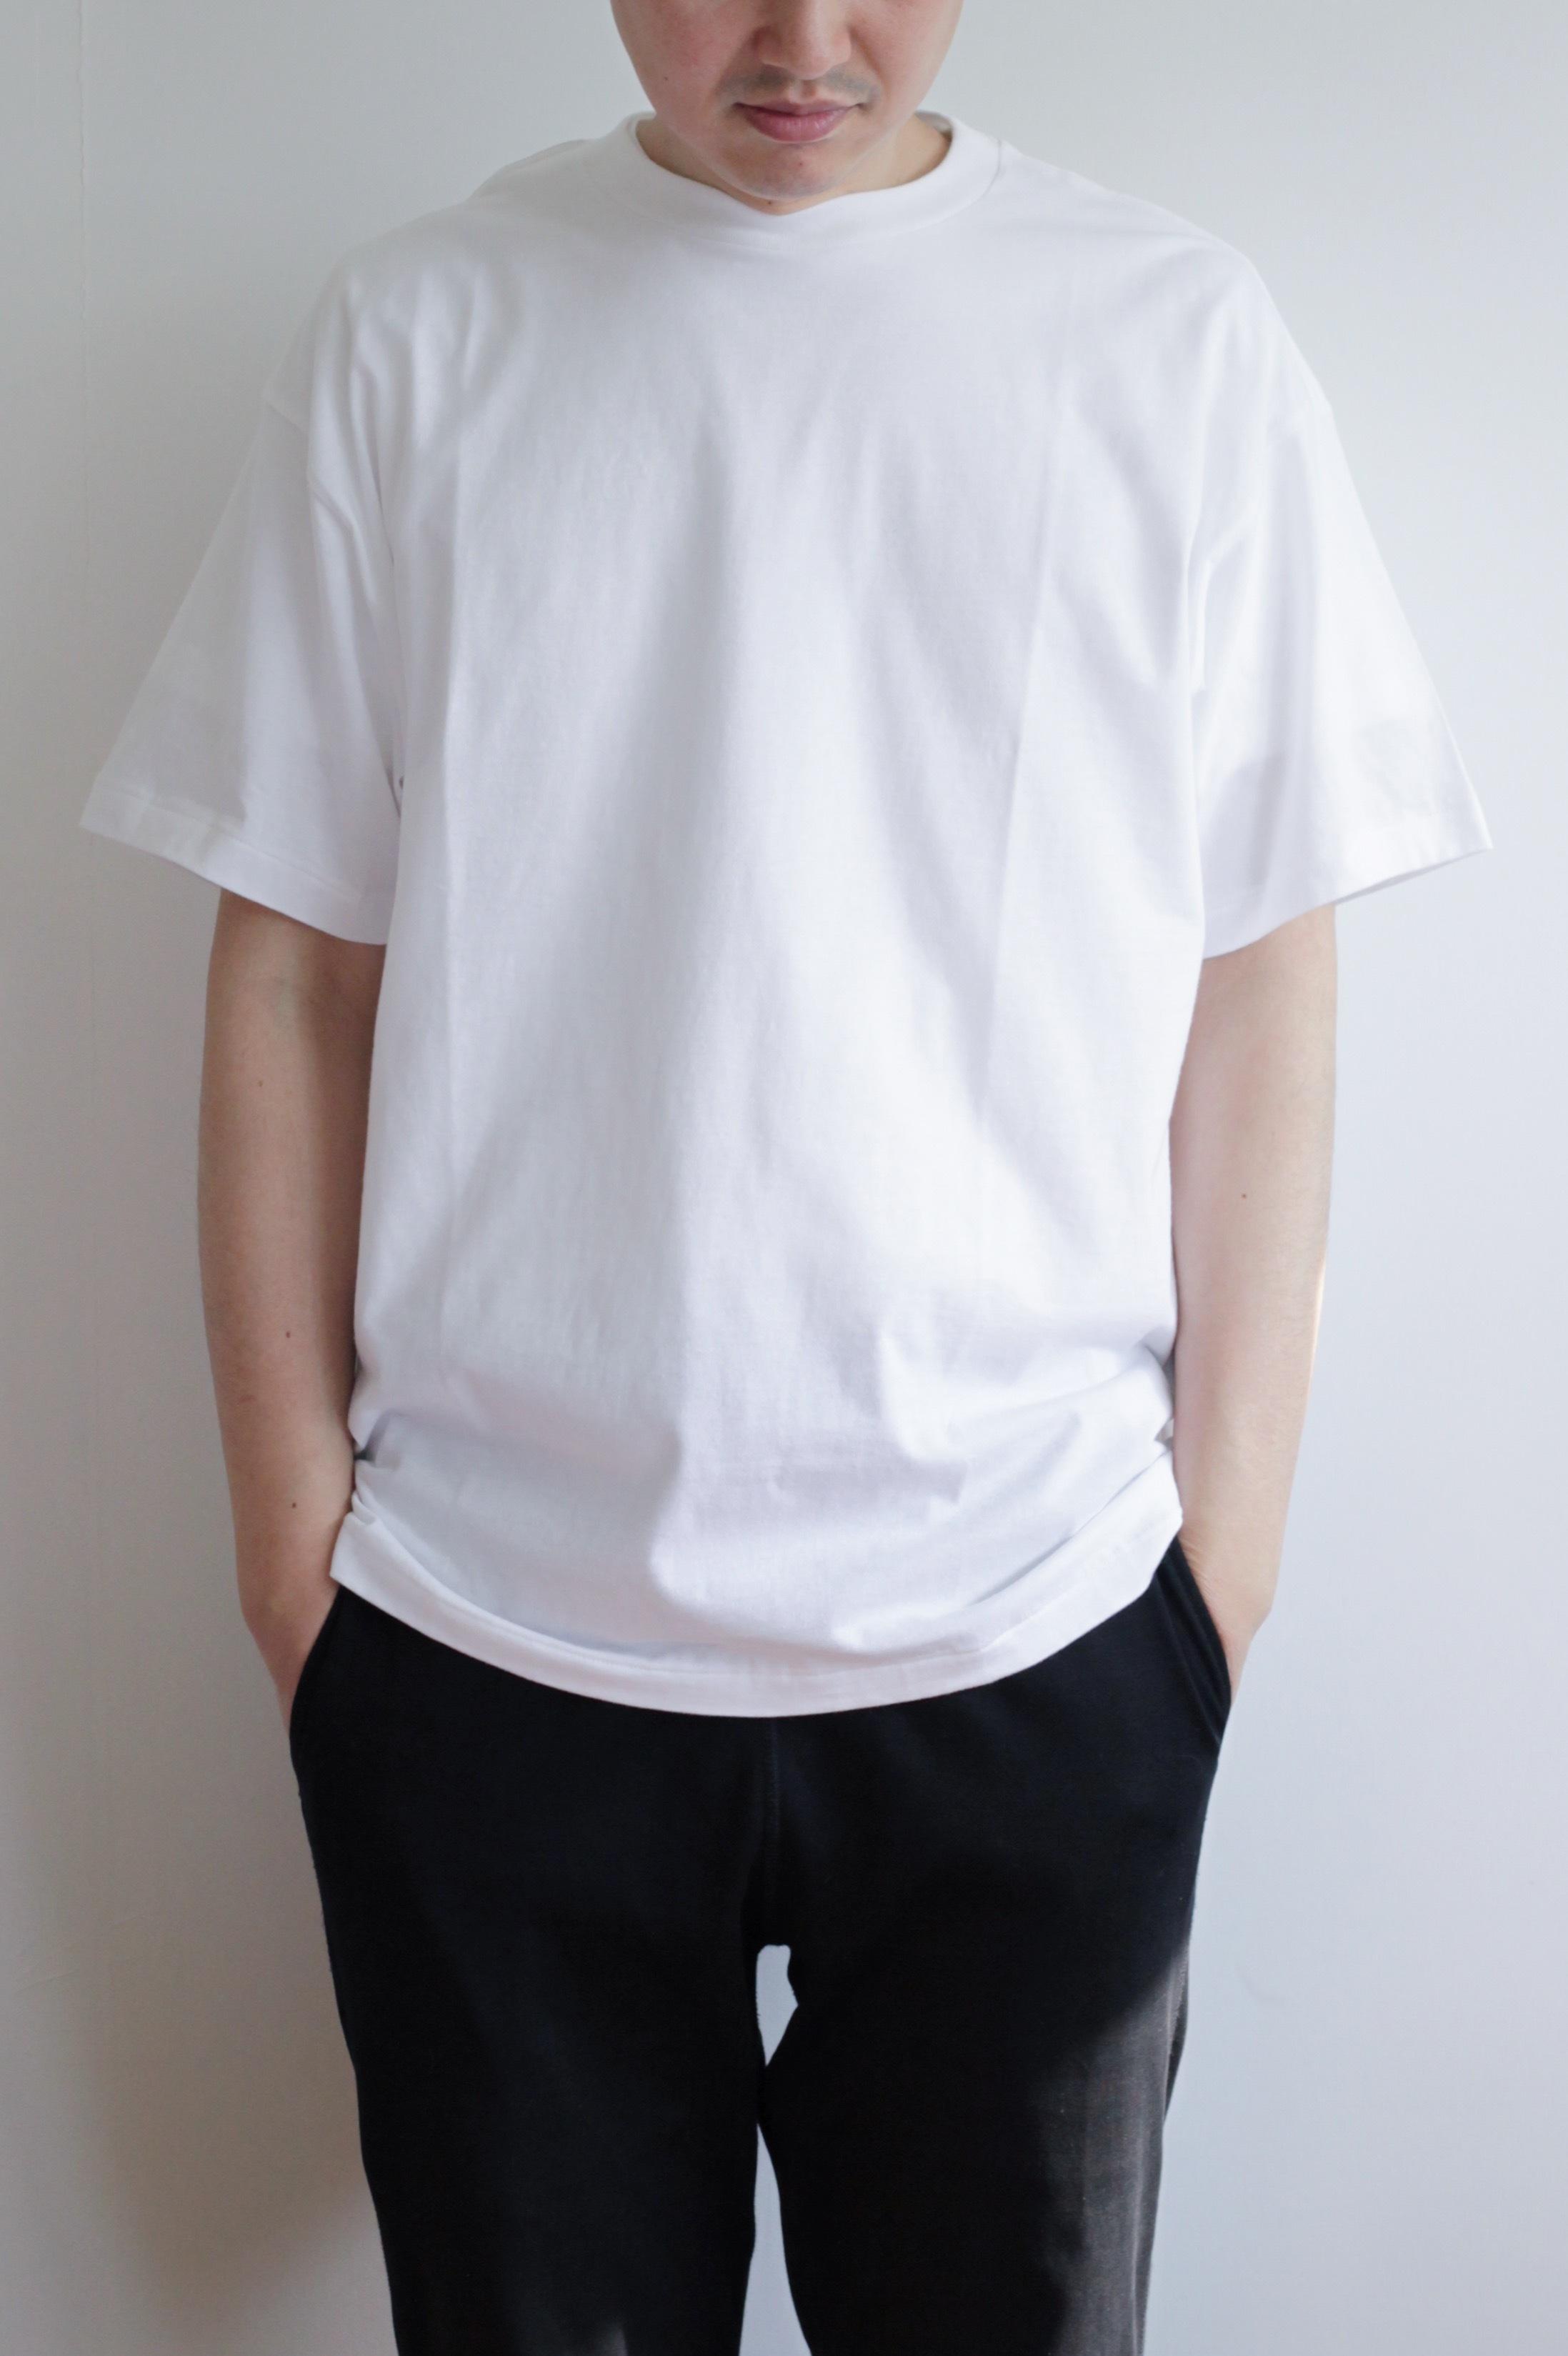 【N.HOOLYWOOD(エヌハリウッド)】2PACK T-SHIRT 9201-CS05-068 pieces